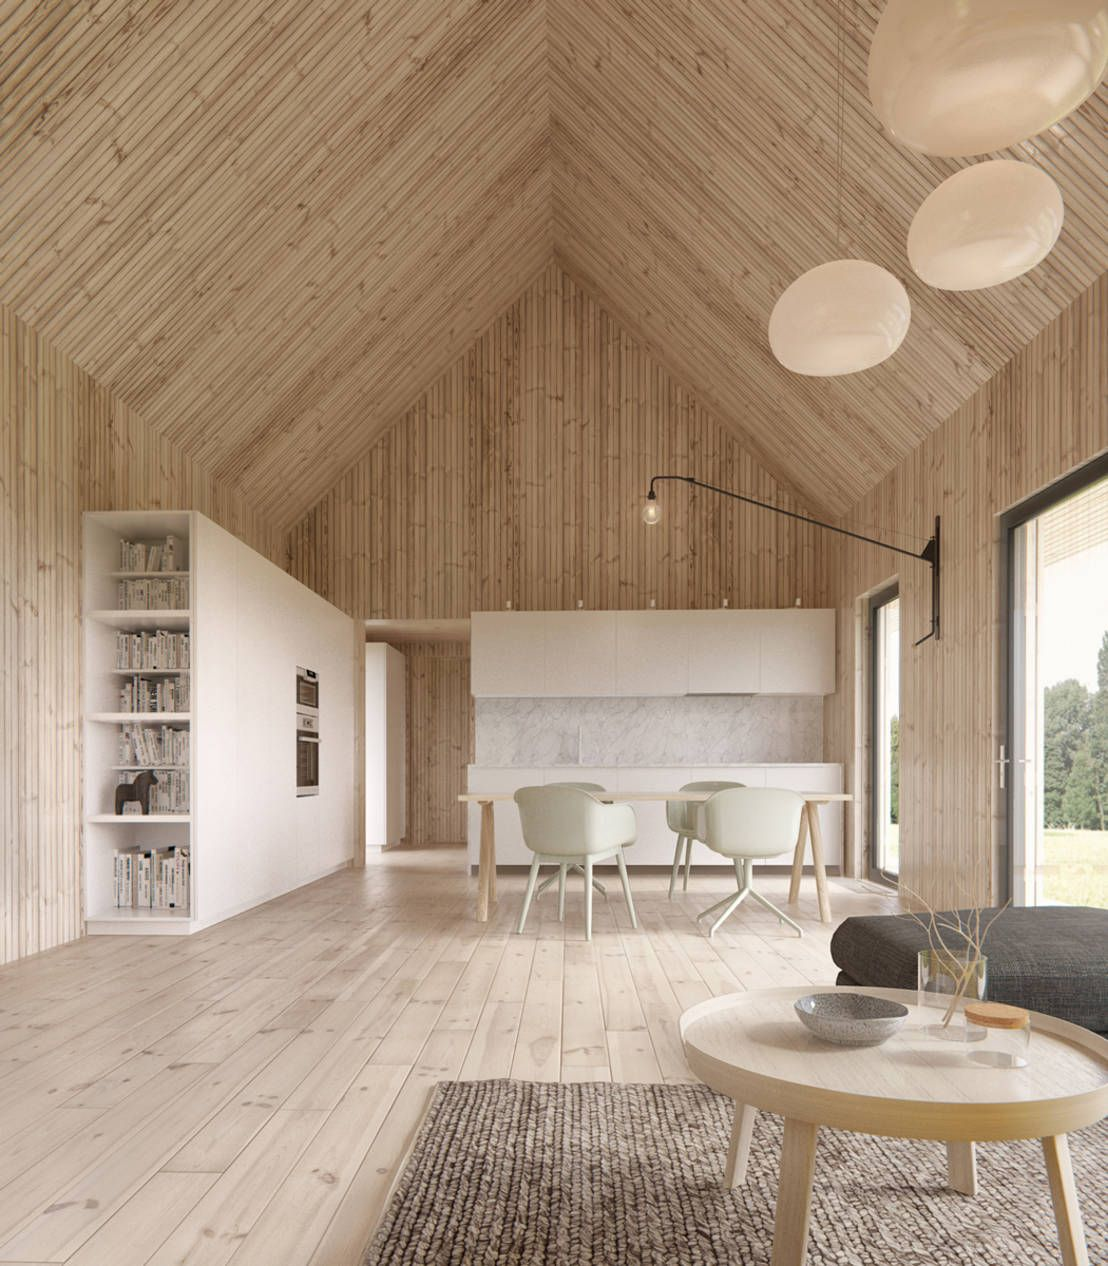 6 architetti per 6 stili diversi design interiors